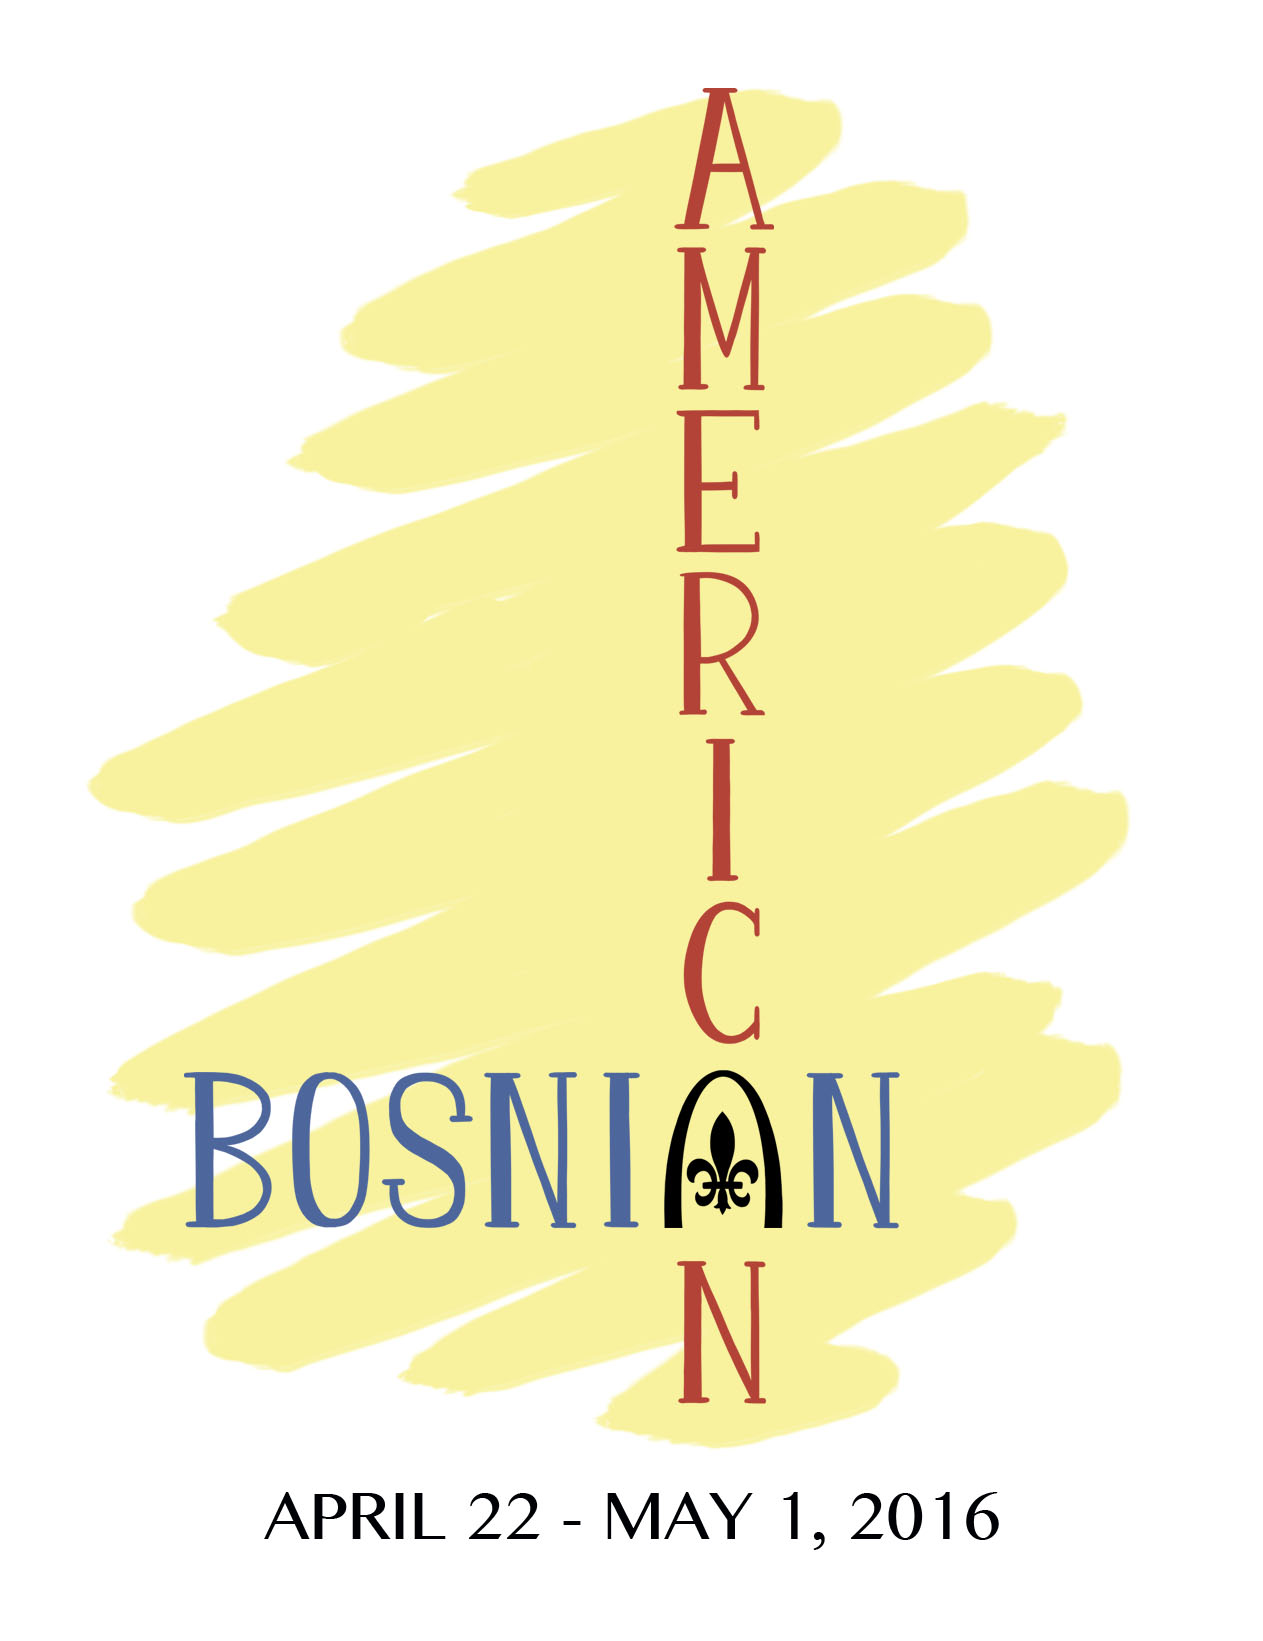 Mustard seed theater 2015 2016 bosnian american postcard fandeluxe Choice Image